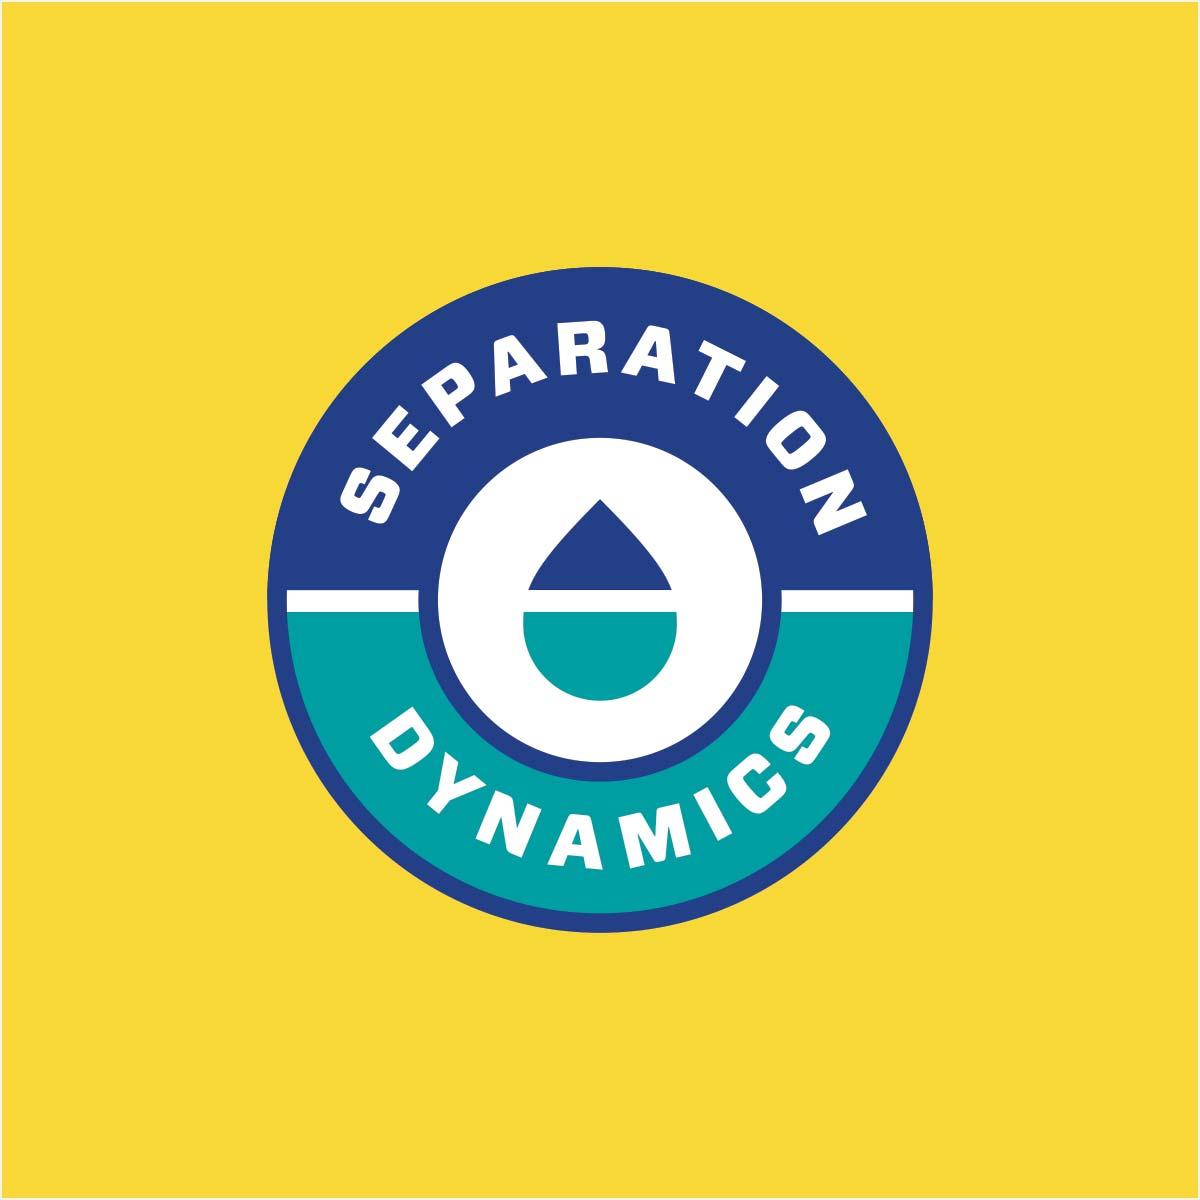 Separation Dynamics logo on yellow